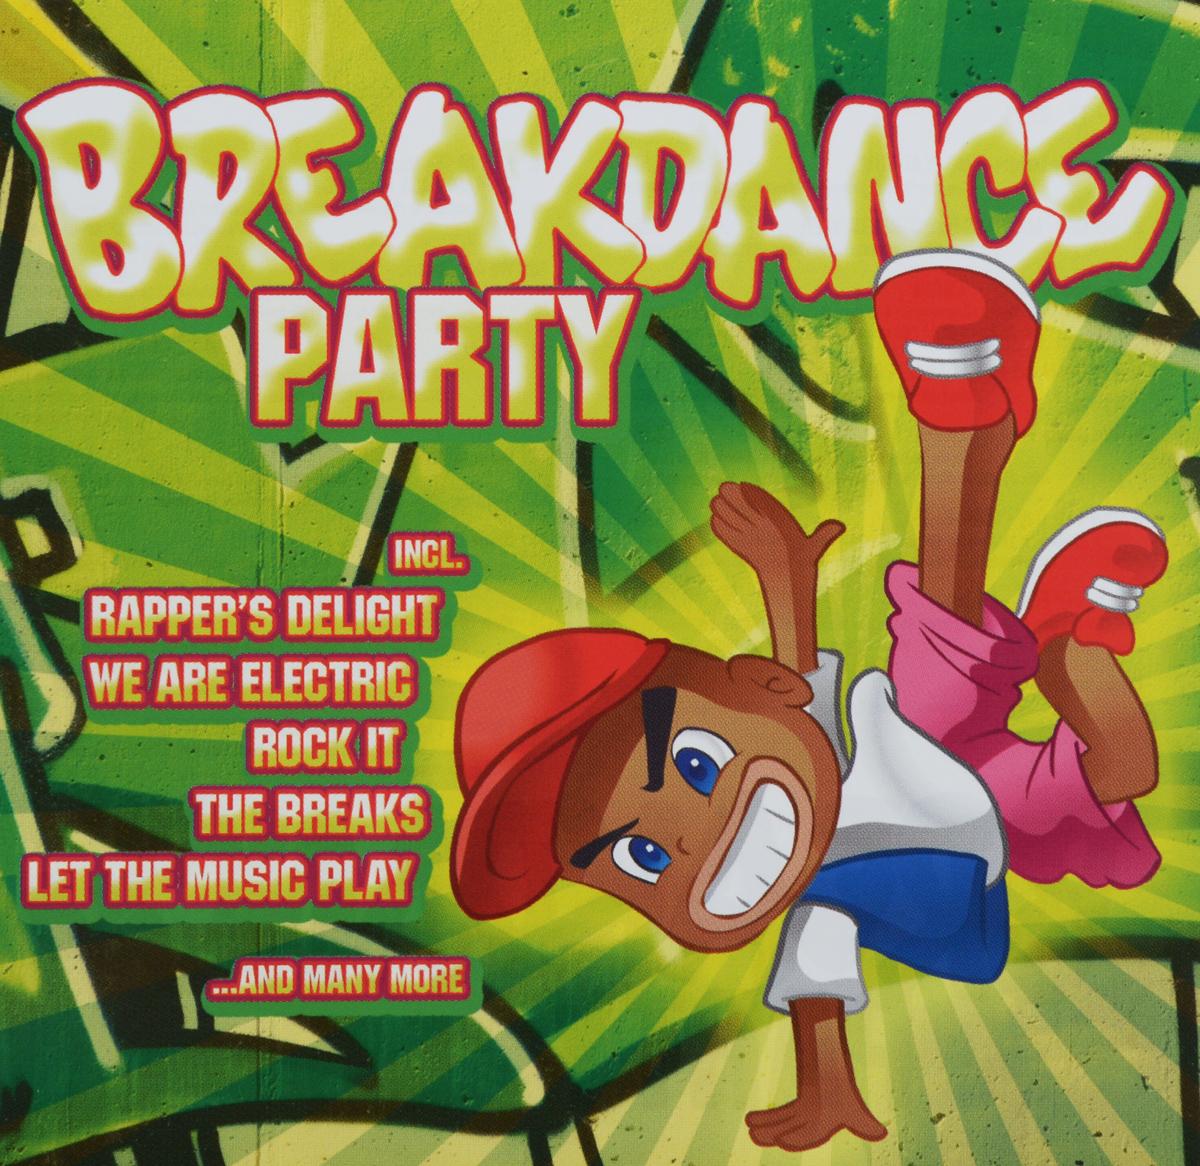 MC Platinum,Mr. Bass,Engin,Danceteria,Lady Bass,Coolio,Tony B,Streetstyler,Captain Bass,Mic-Hustlers,Jamsonic,Air Lovers Breakdance Party (2 CD)